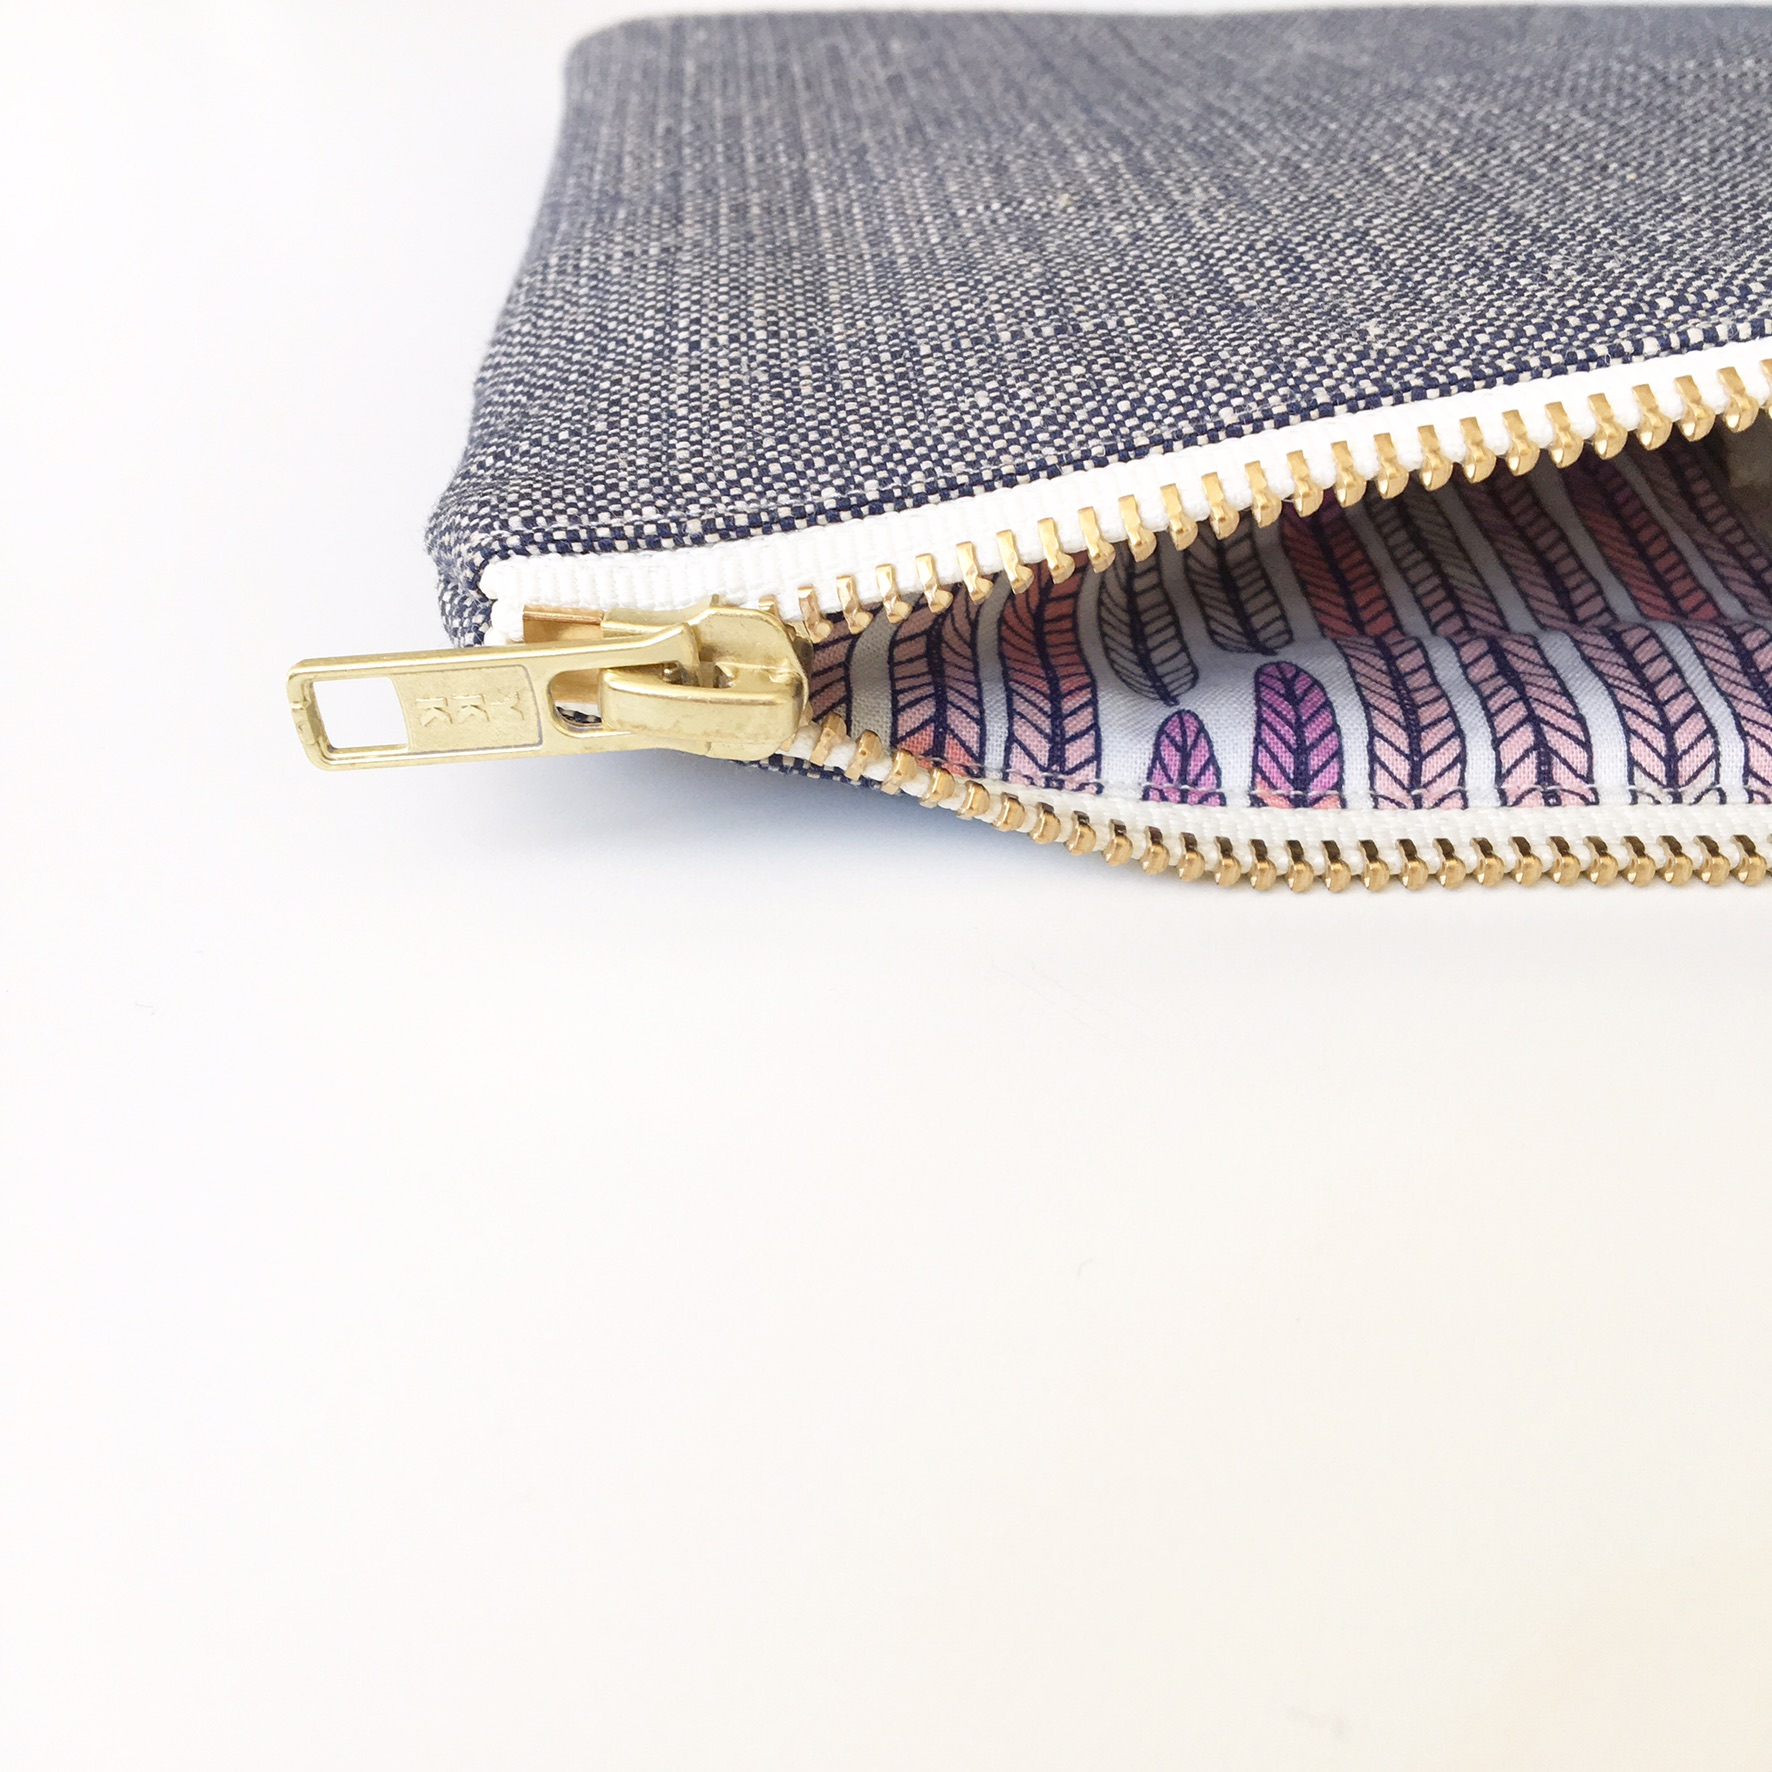 Lavender Collection Navy organic hemp-cotton lutch bag